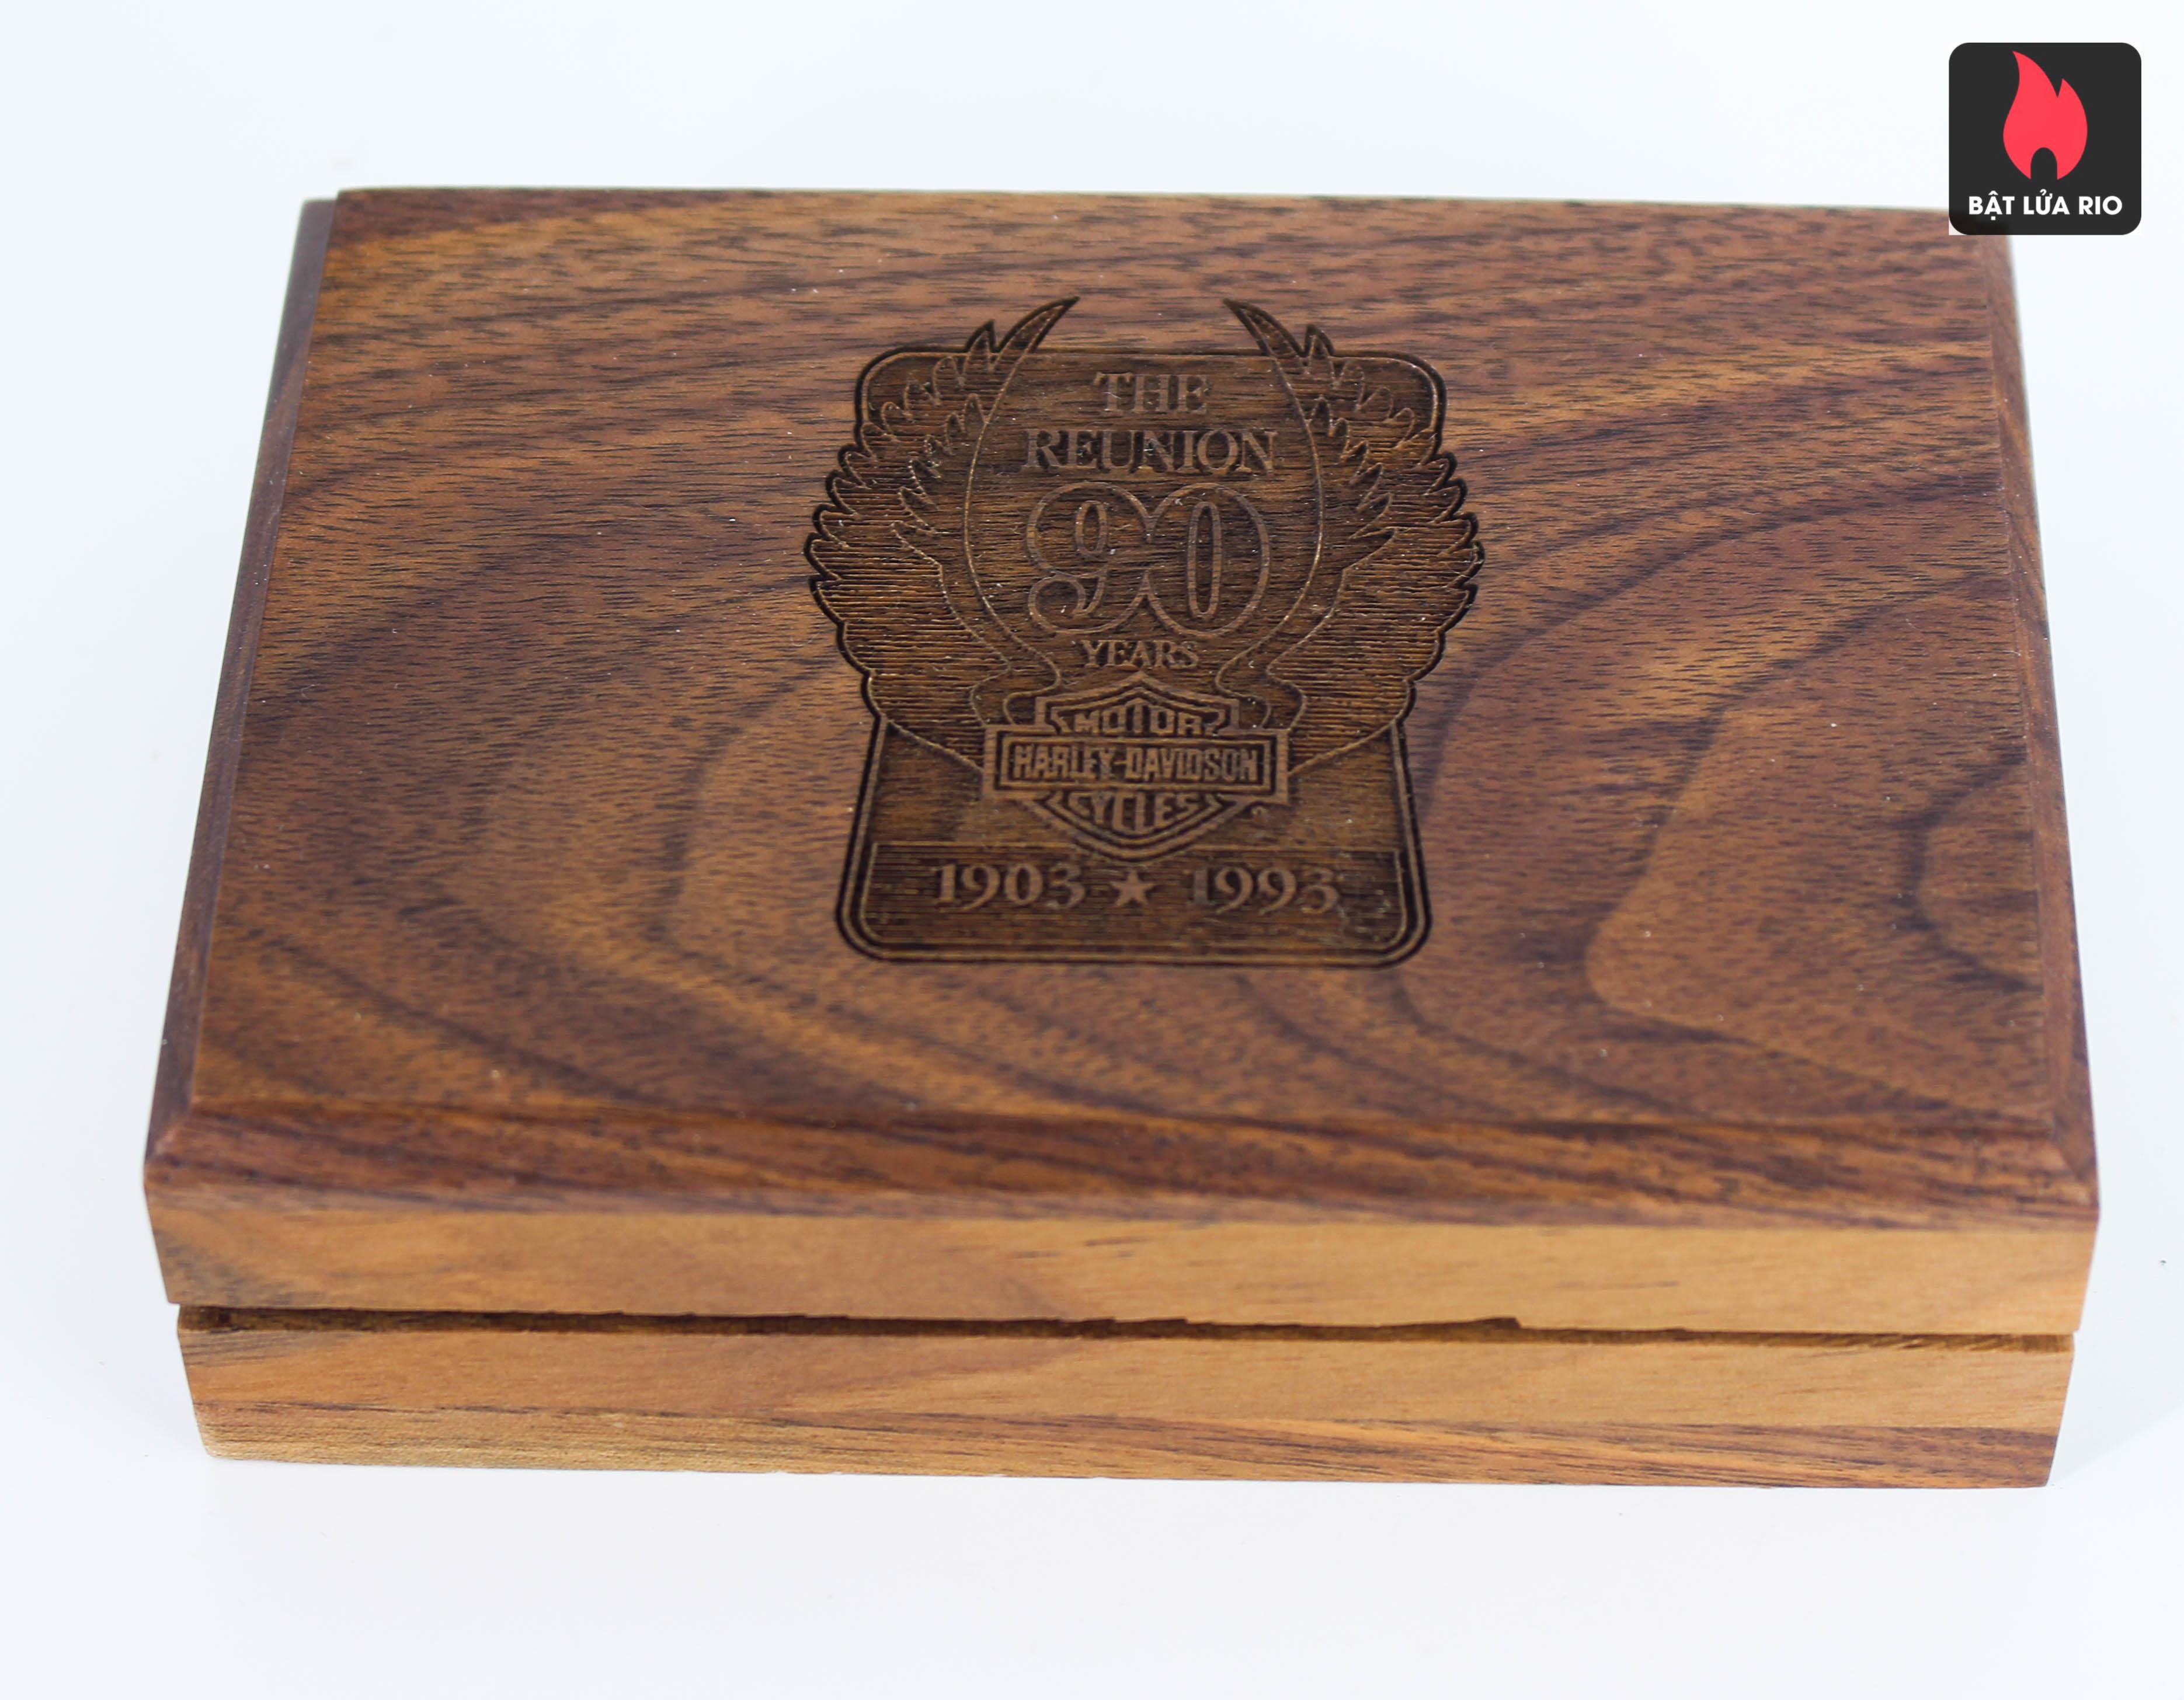 ZIPPO LA MÃ 1992 - 90TH ANNIVERSARY 1903-1993 – HARLEY DAVIDSON®